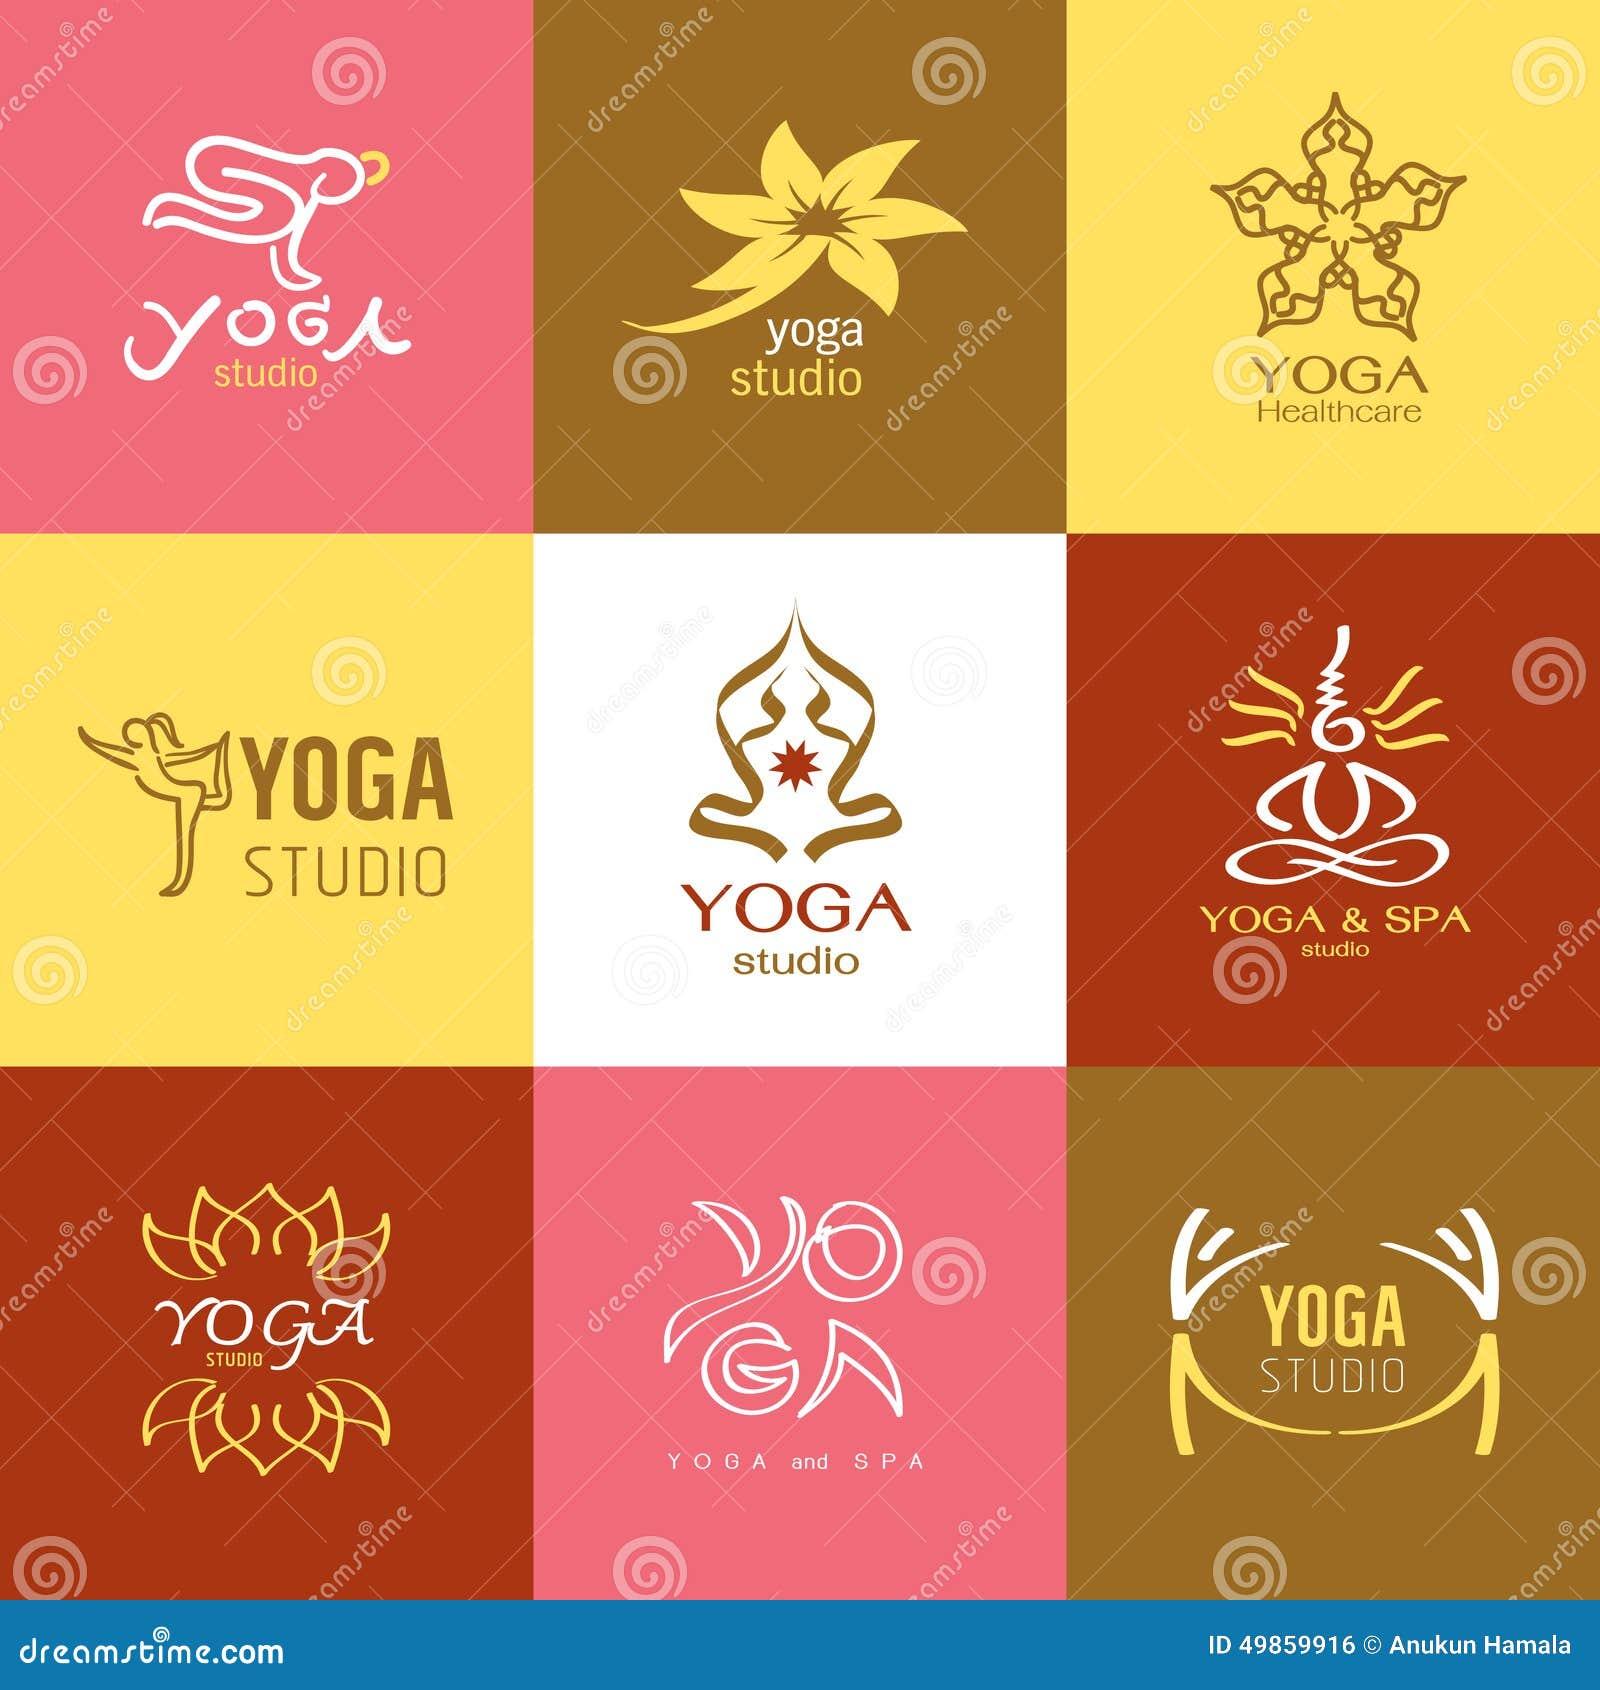 Logos And Icons Set For Yoga Studio Or Meditation Class